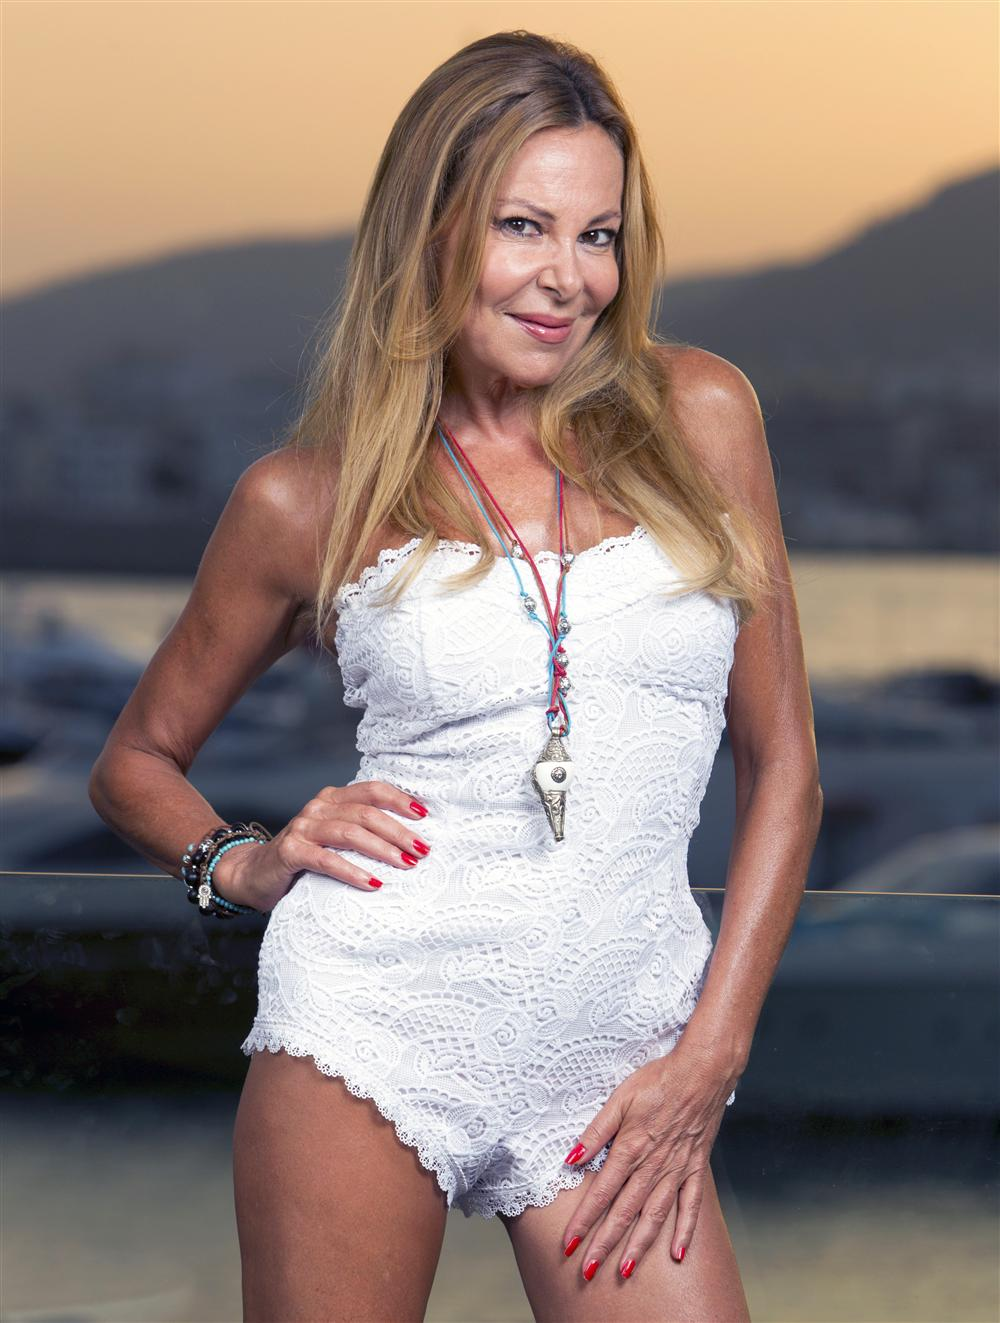 Ana Obregon pic 41